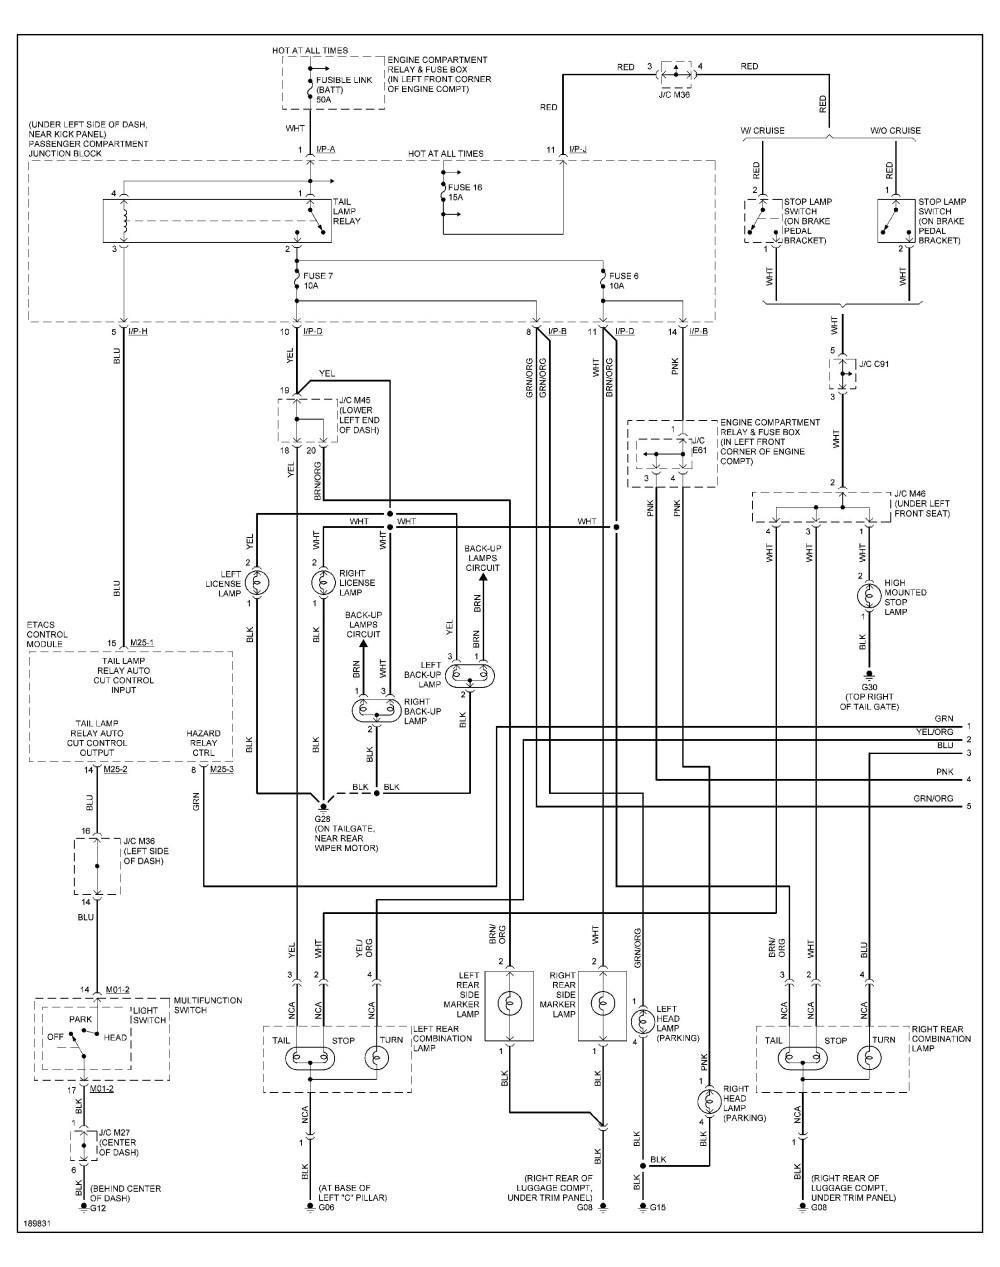 medium resolution of 2000 hyundai elantra engine diagram 2005 hyundai accent engine diagram car 04 hyundai accent engine of